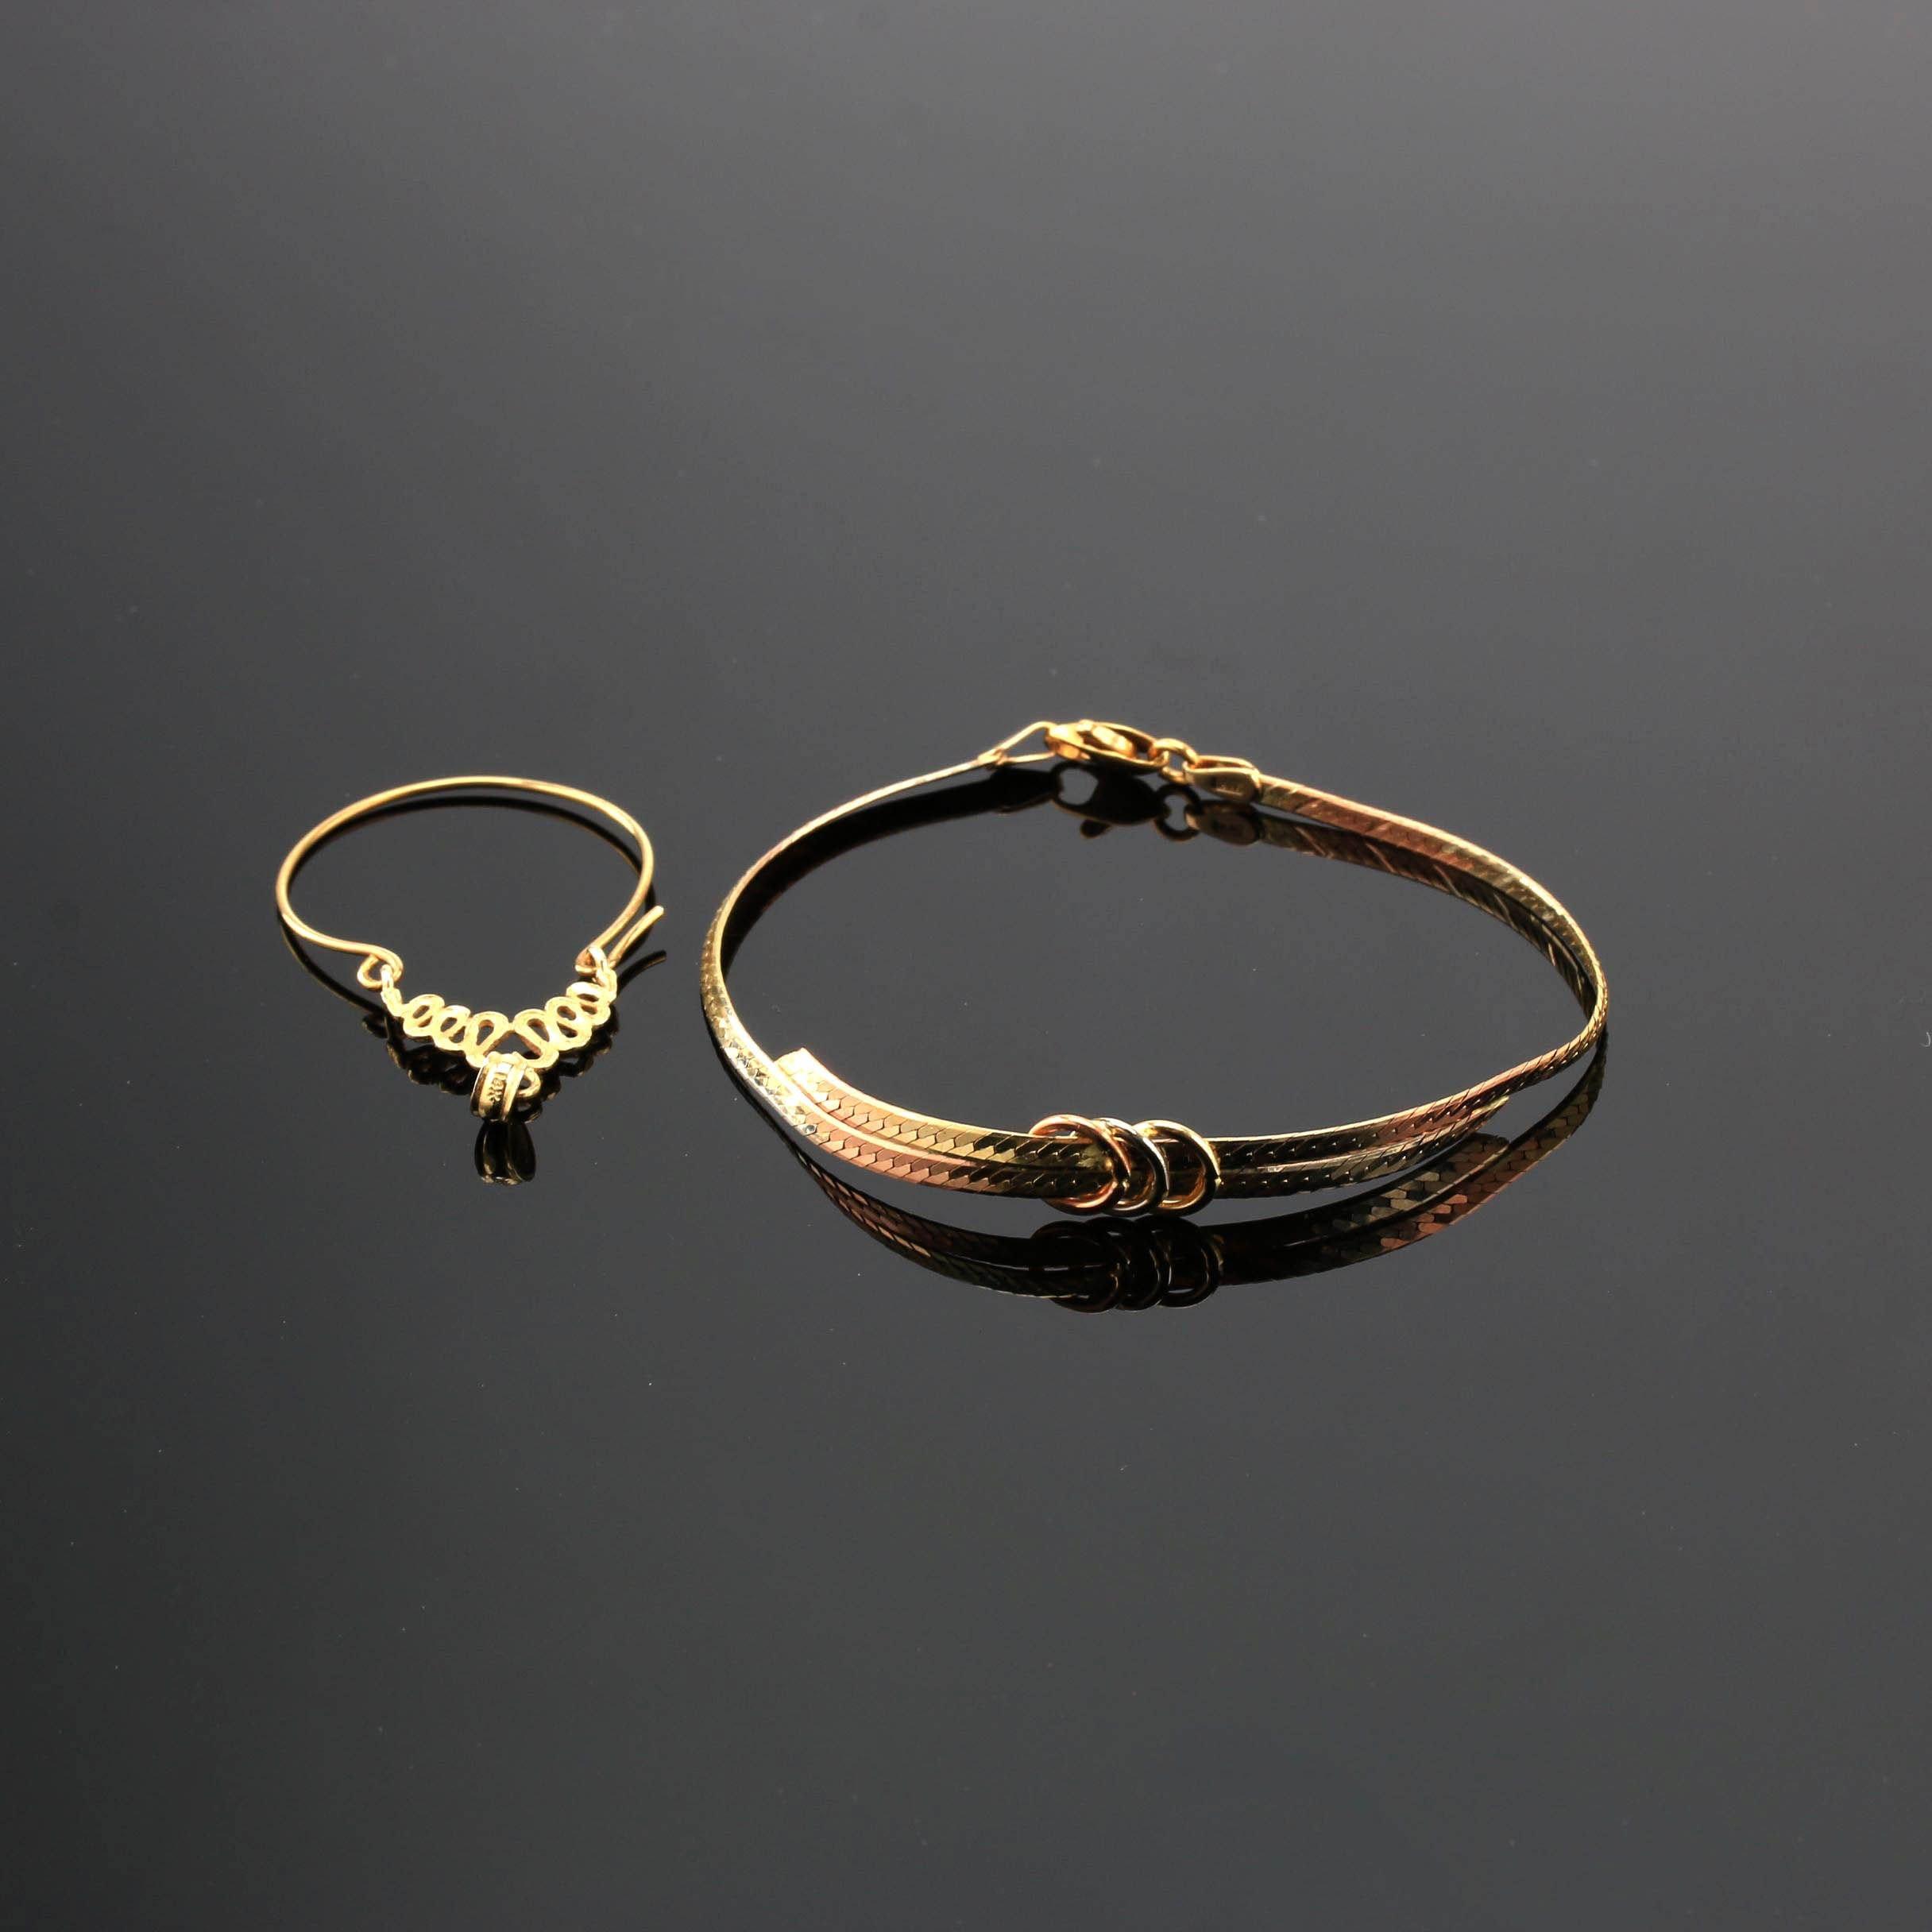 14K Yellow and Rose Gold Herringbone Link Bracelet and Charm Holder